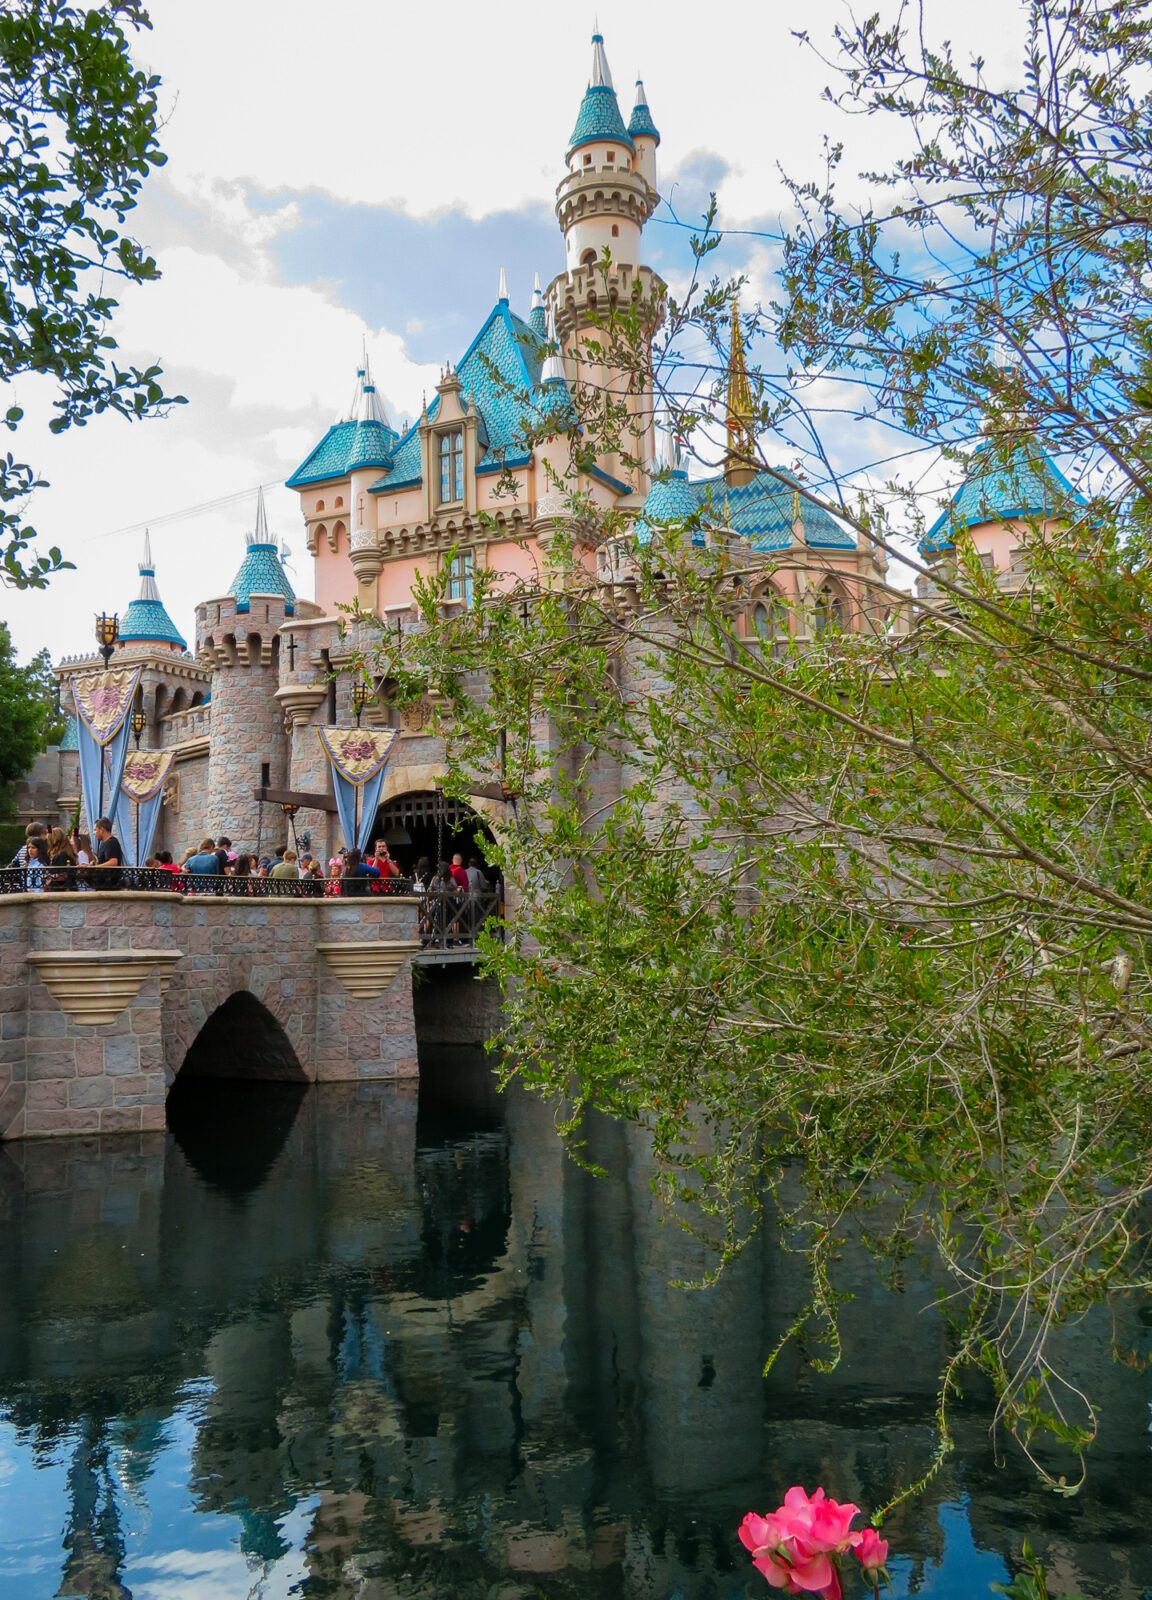 Disneyland with kids